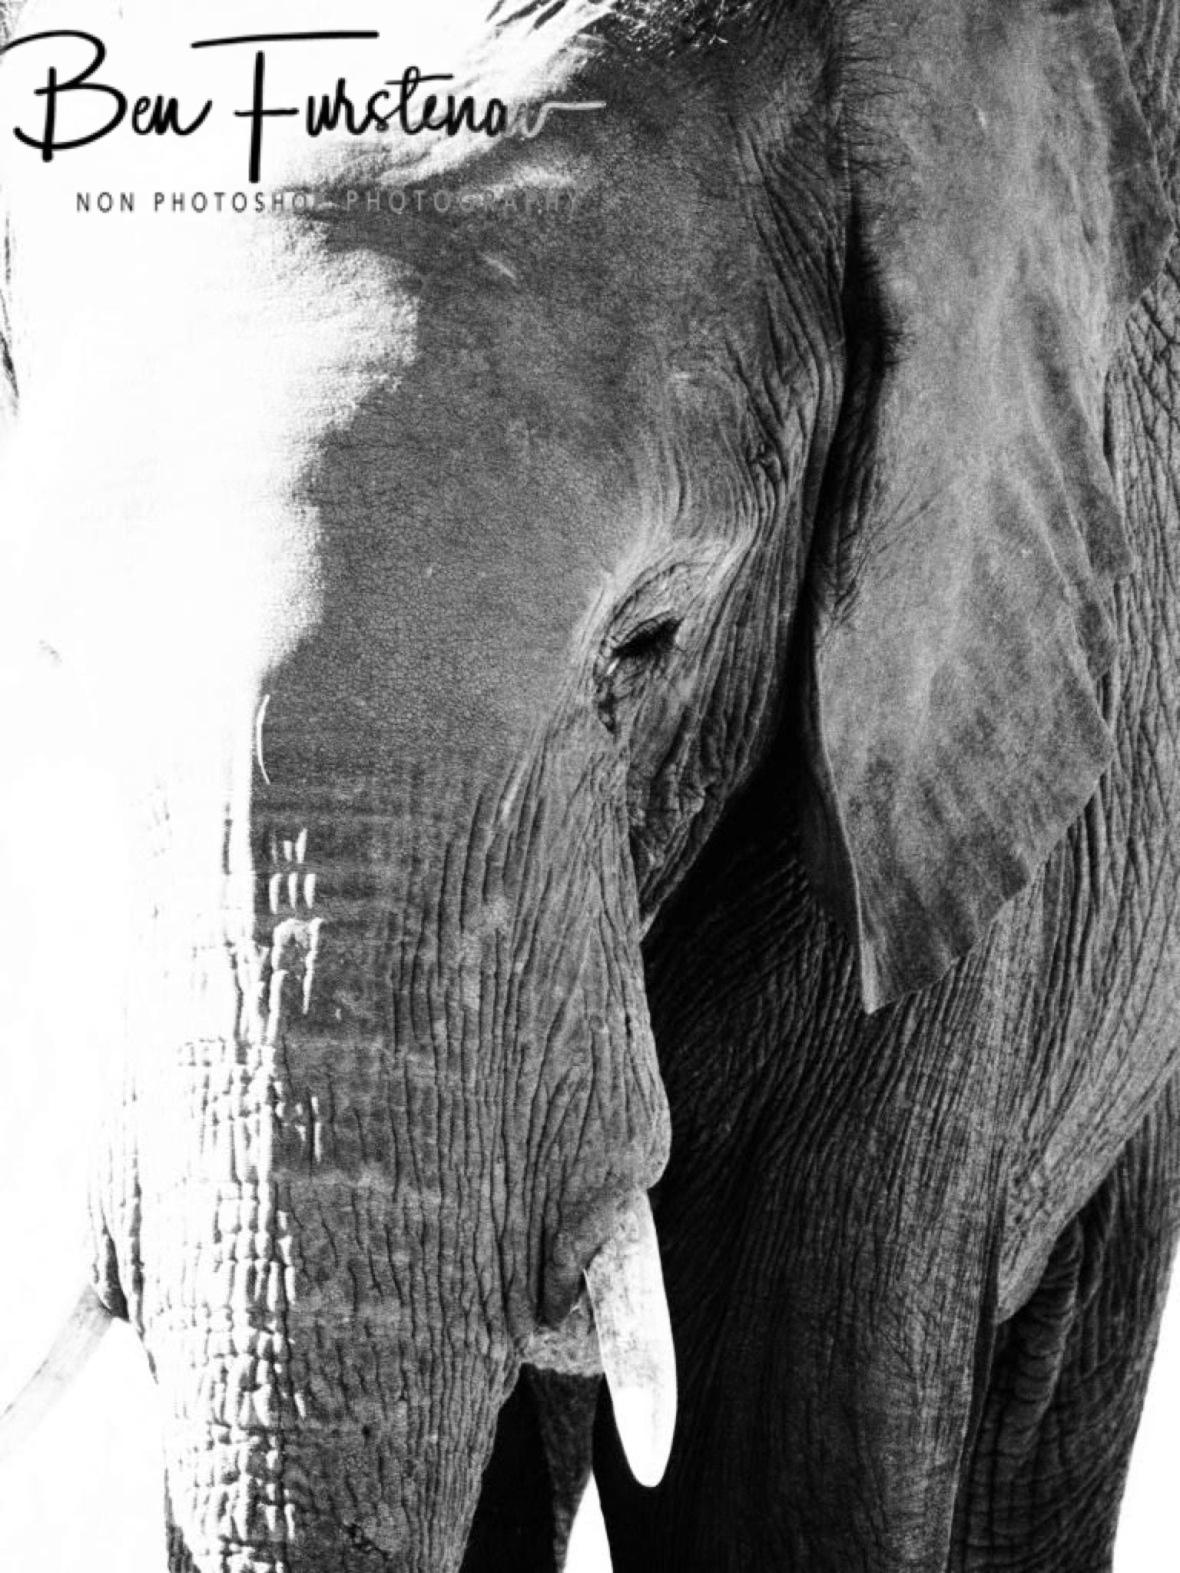 From black to white, Chobe National Park, Botswana